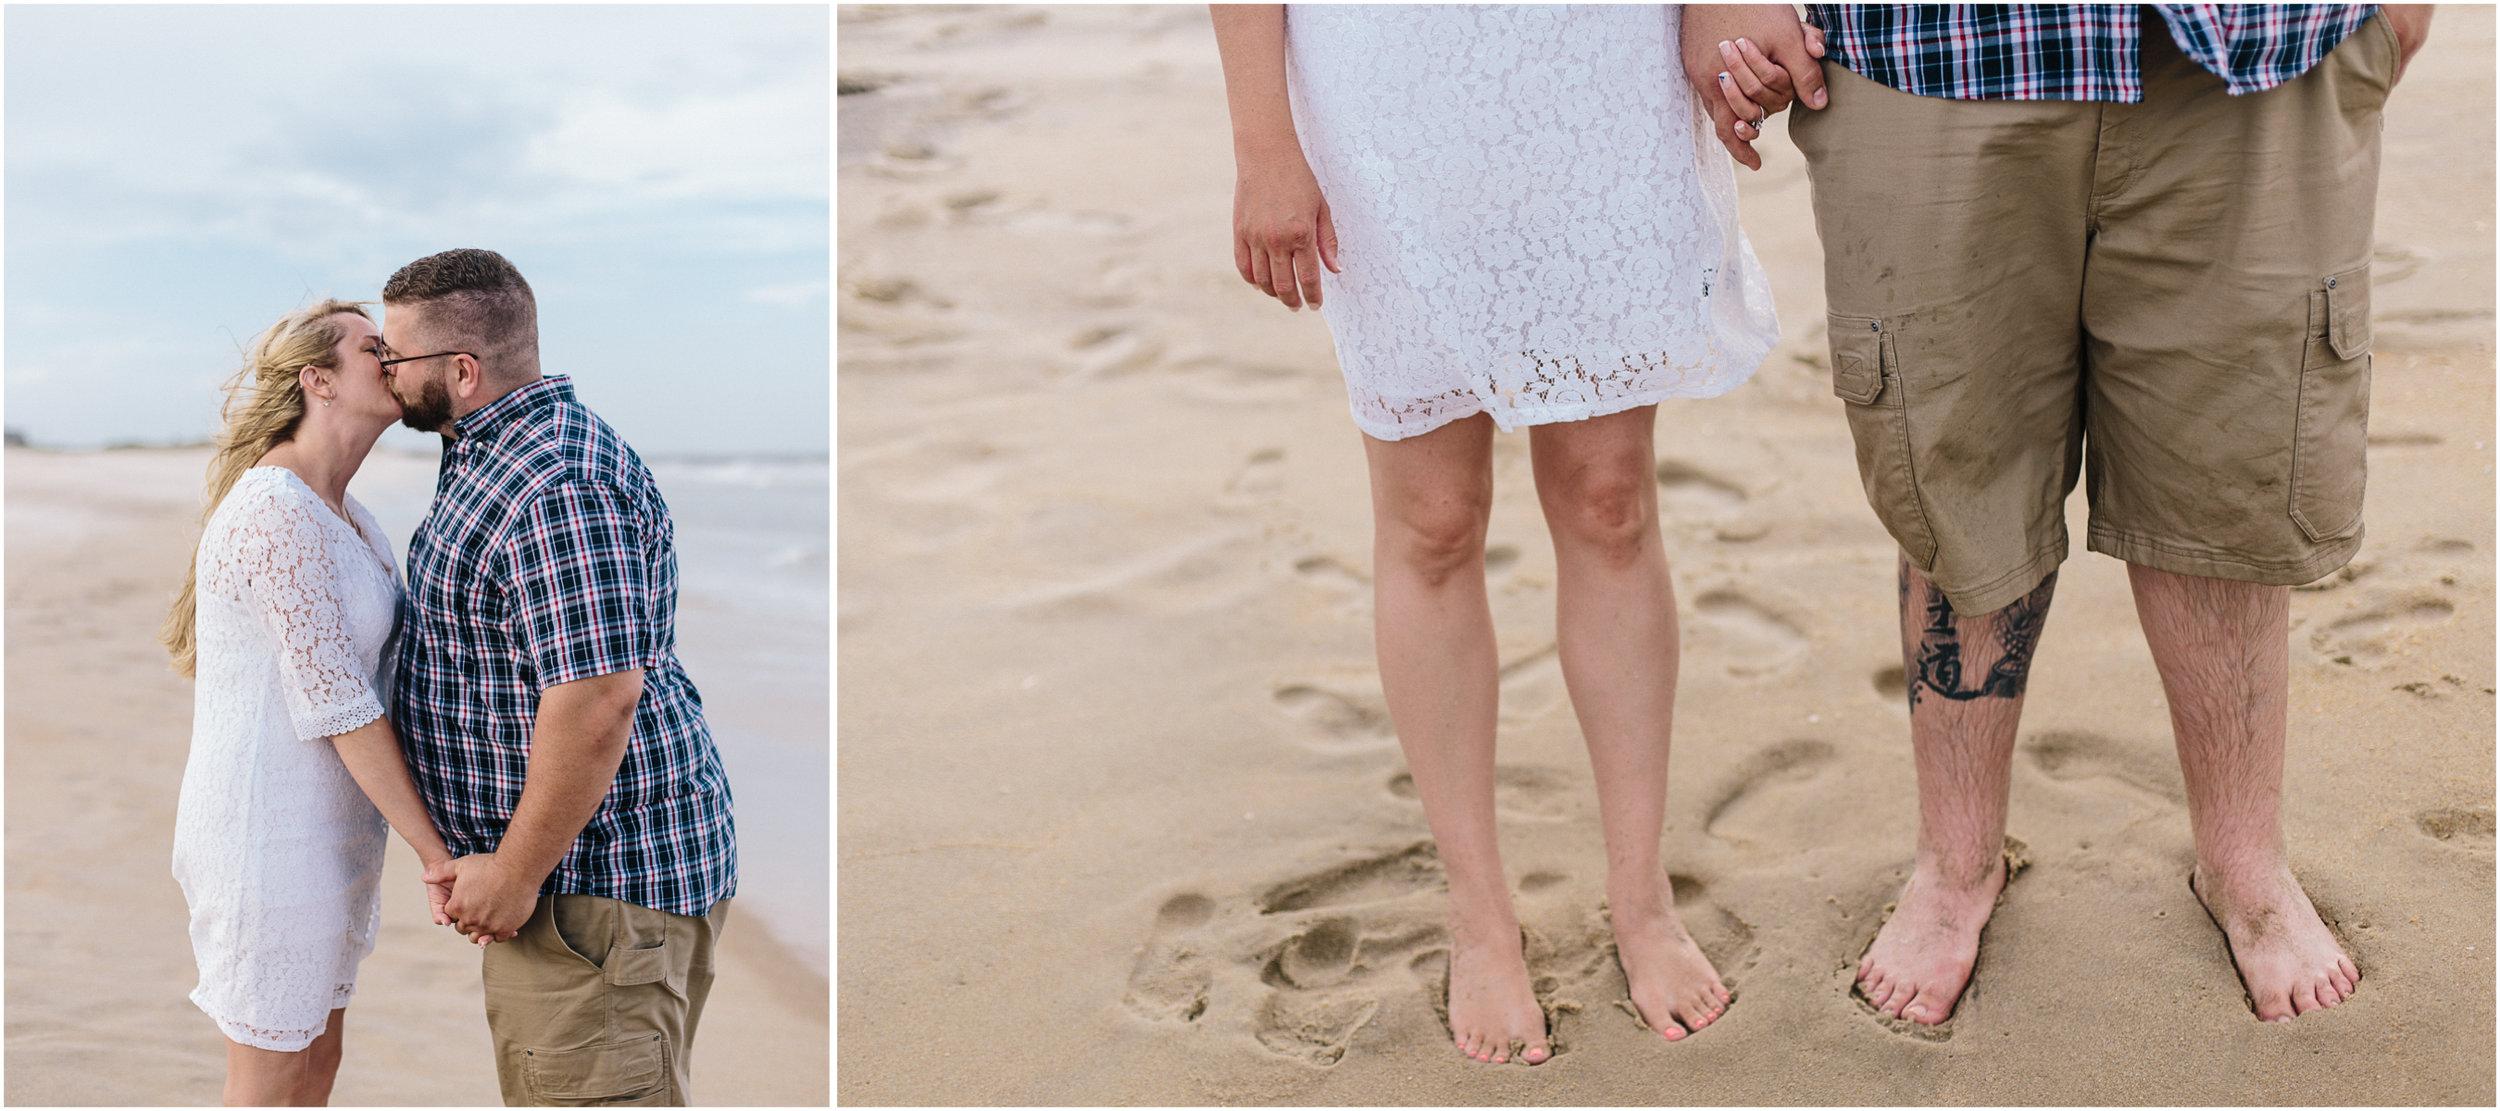 alyssa barletter photography destination wedding travel elopement obx north carolina beach-8.jpg